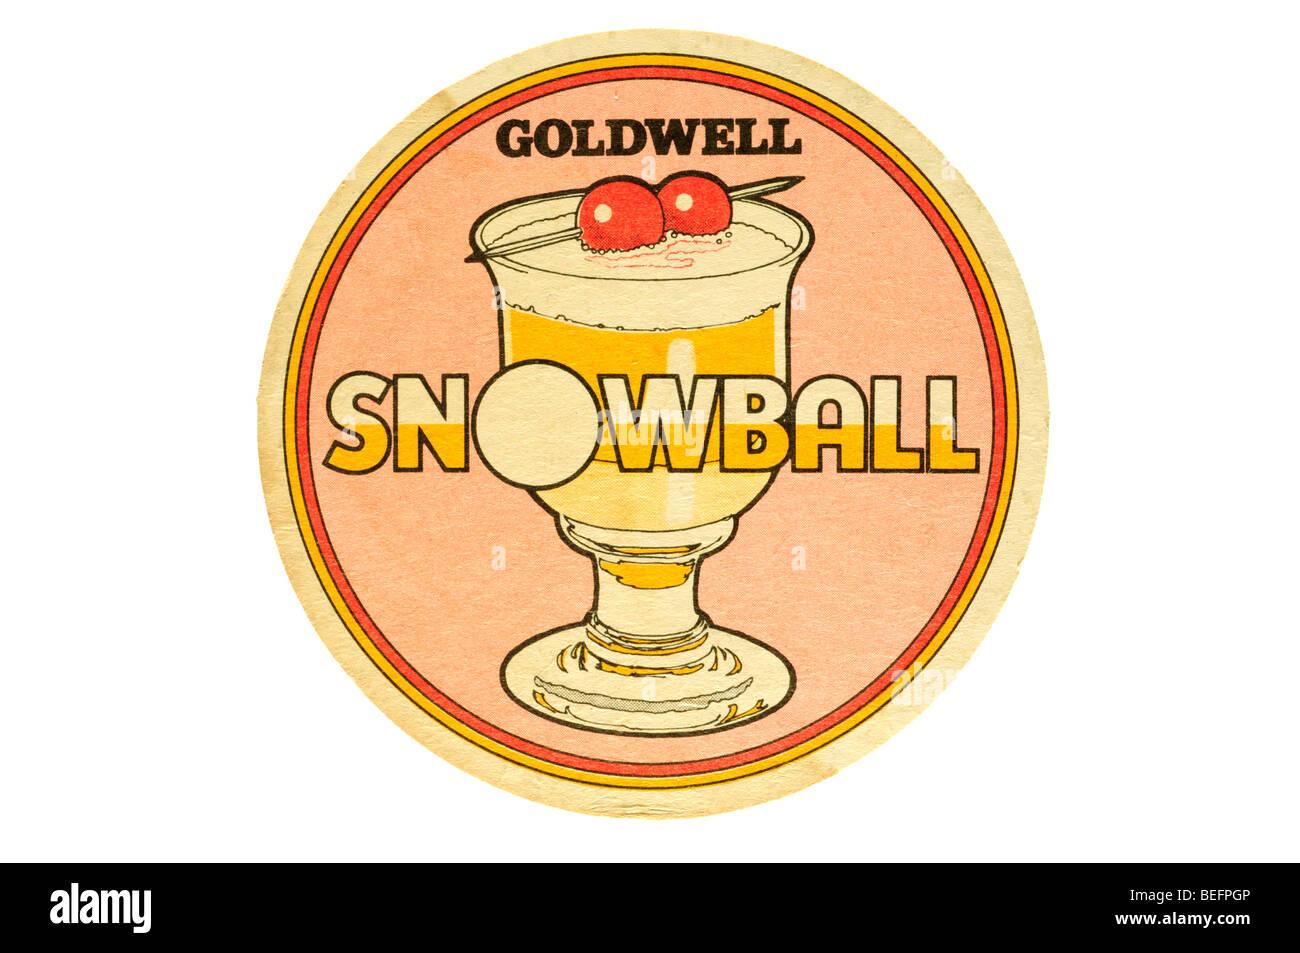 goldwell snowball - Stock Image